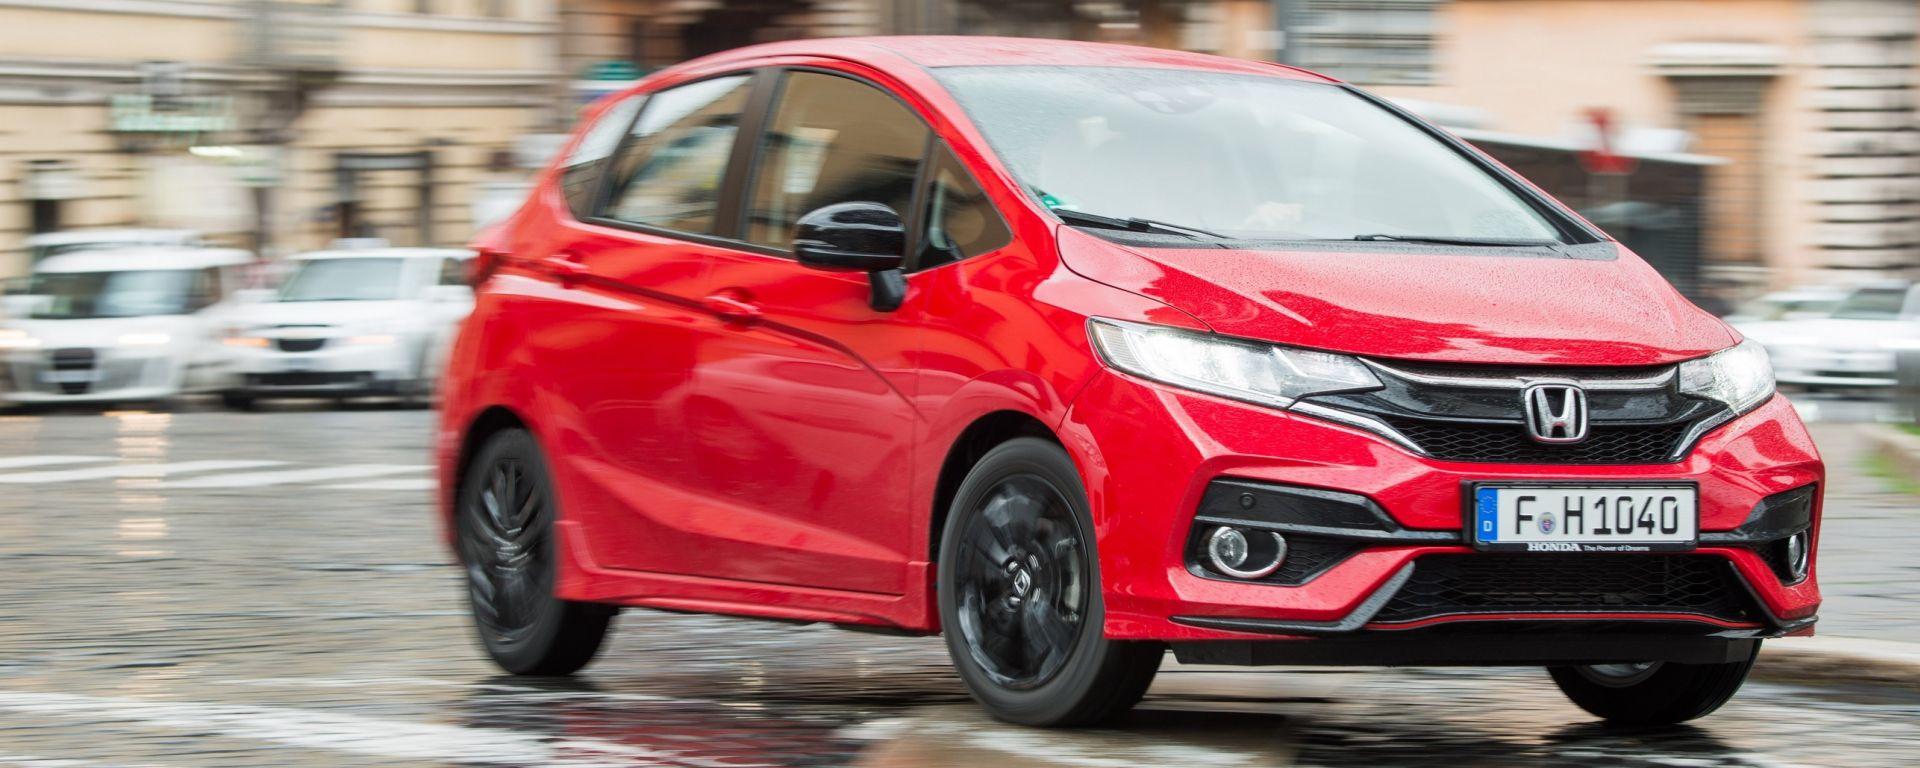 Nuova Honda Jazz 2018: la prova del 1.5 i-VTEC Dynamic